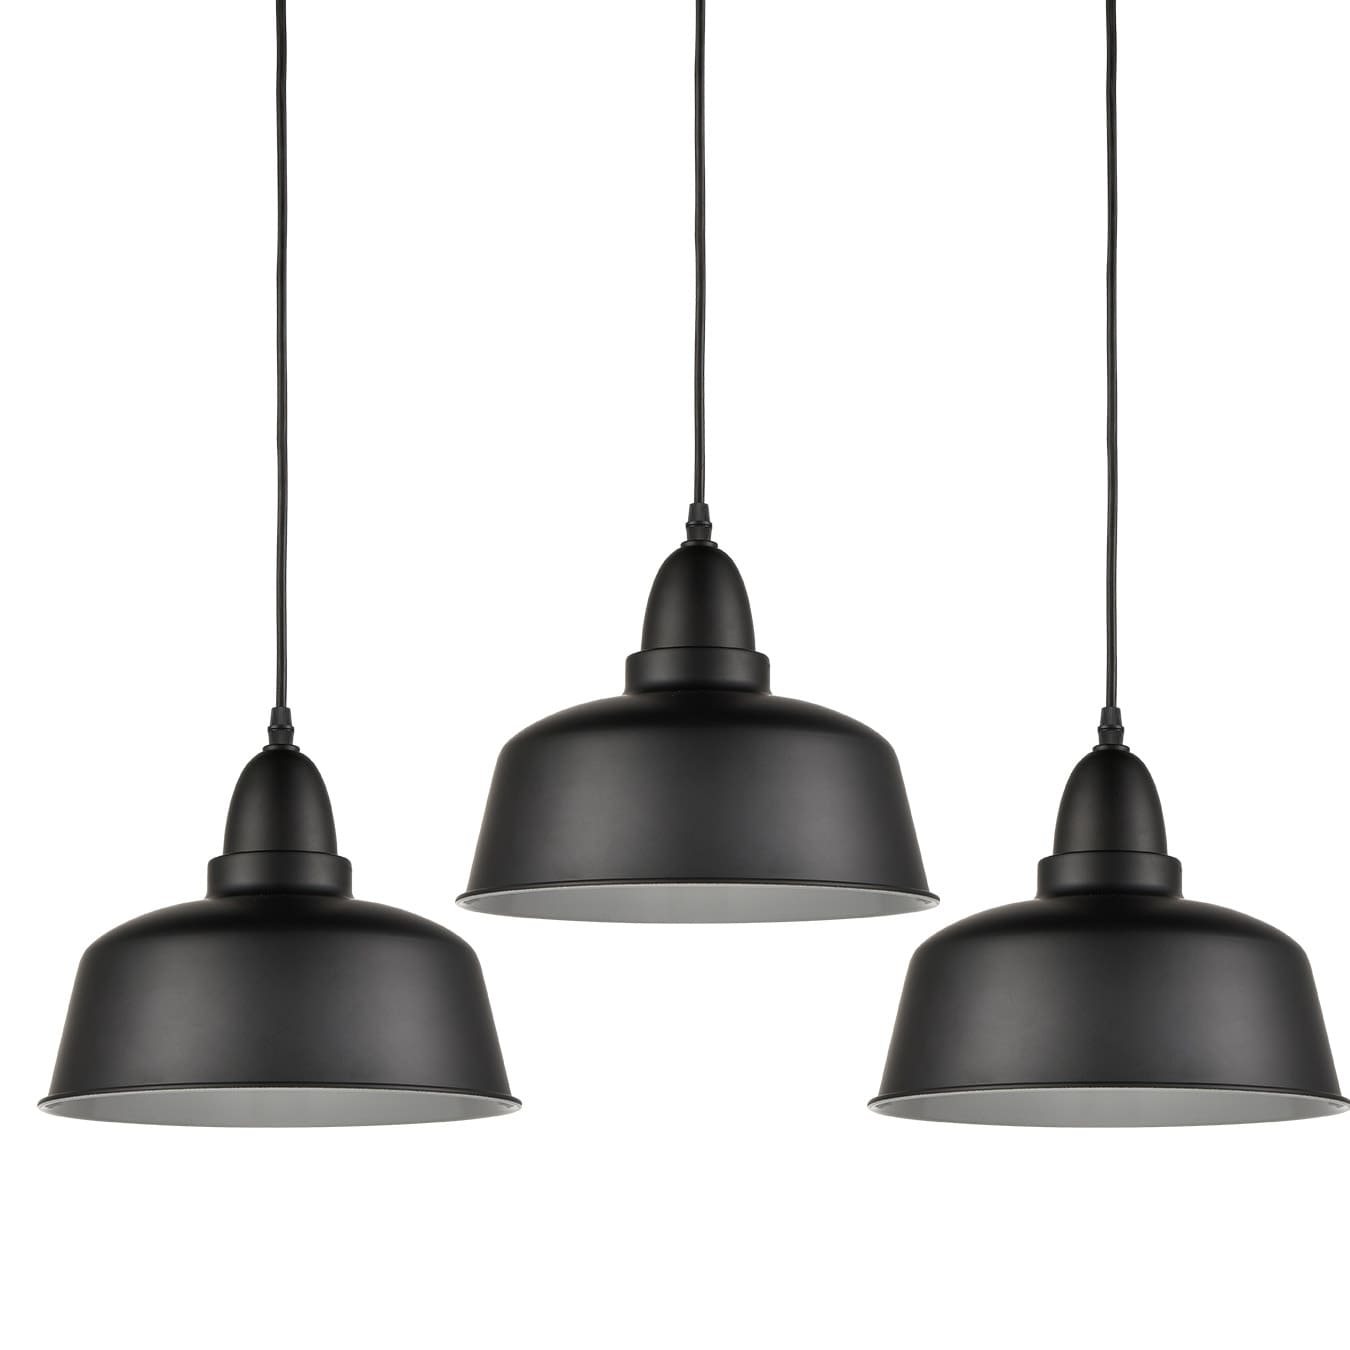 Matte Black Pendant Lighting 3 Pack Vinatge Hanging Metal Pendant Lights